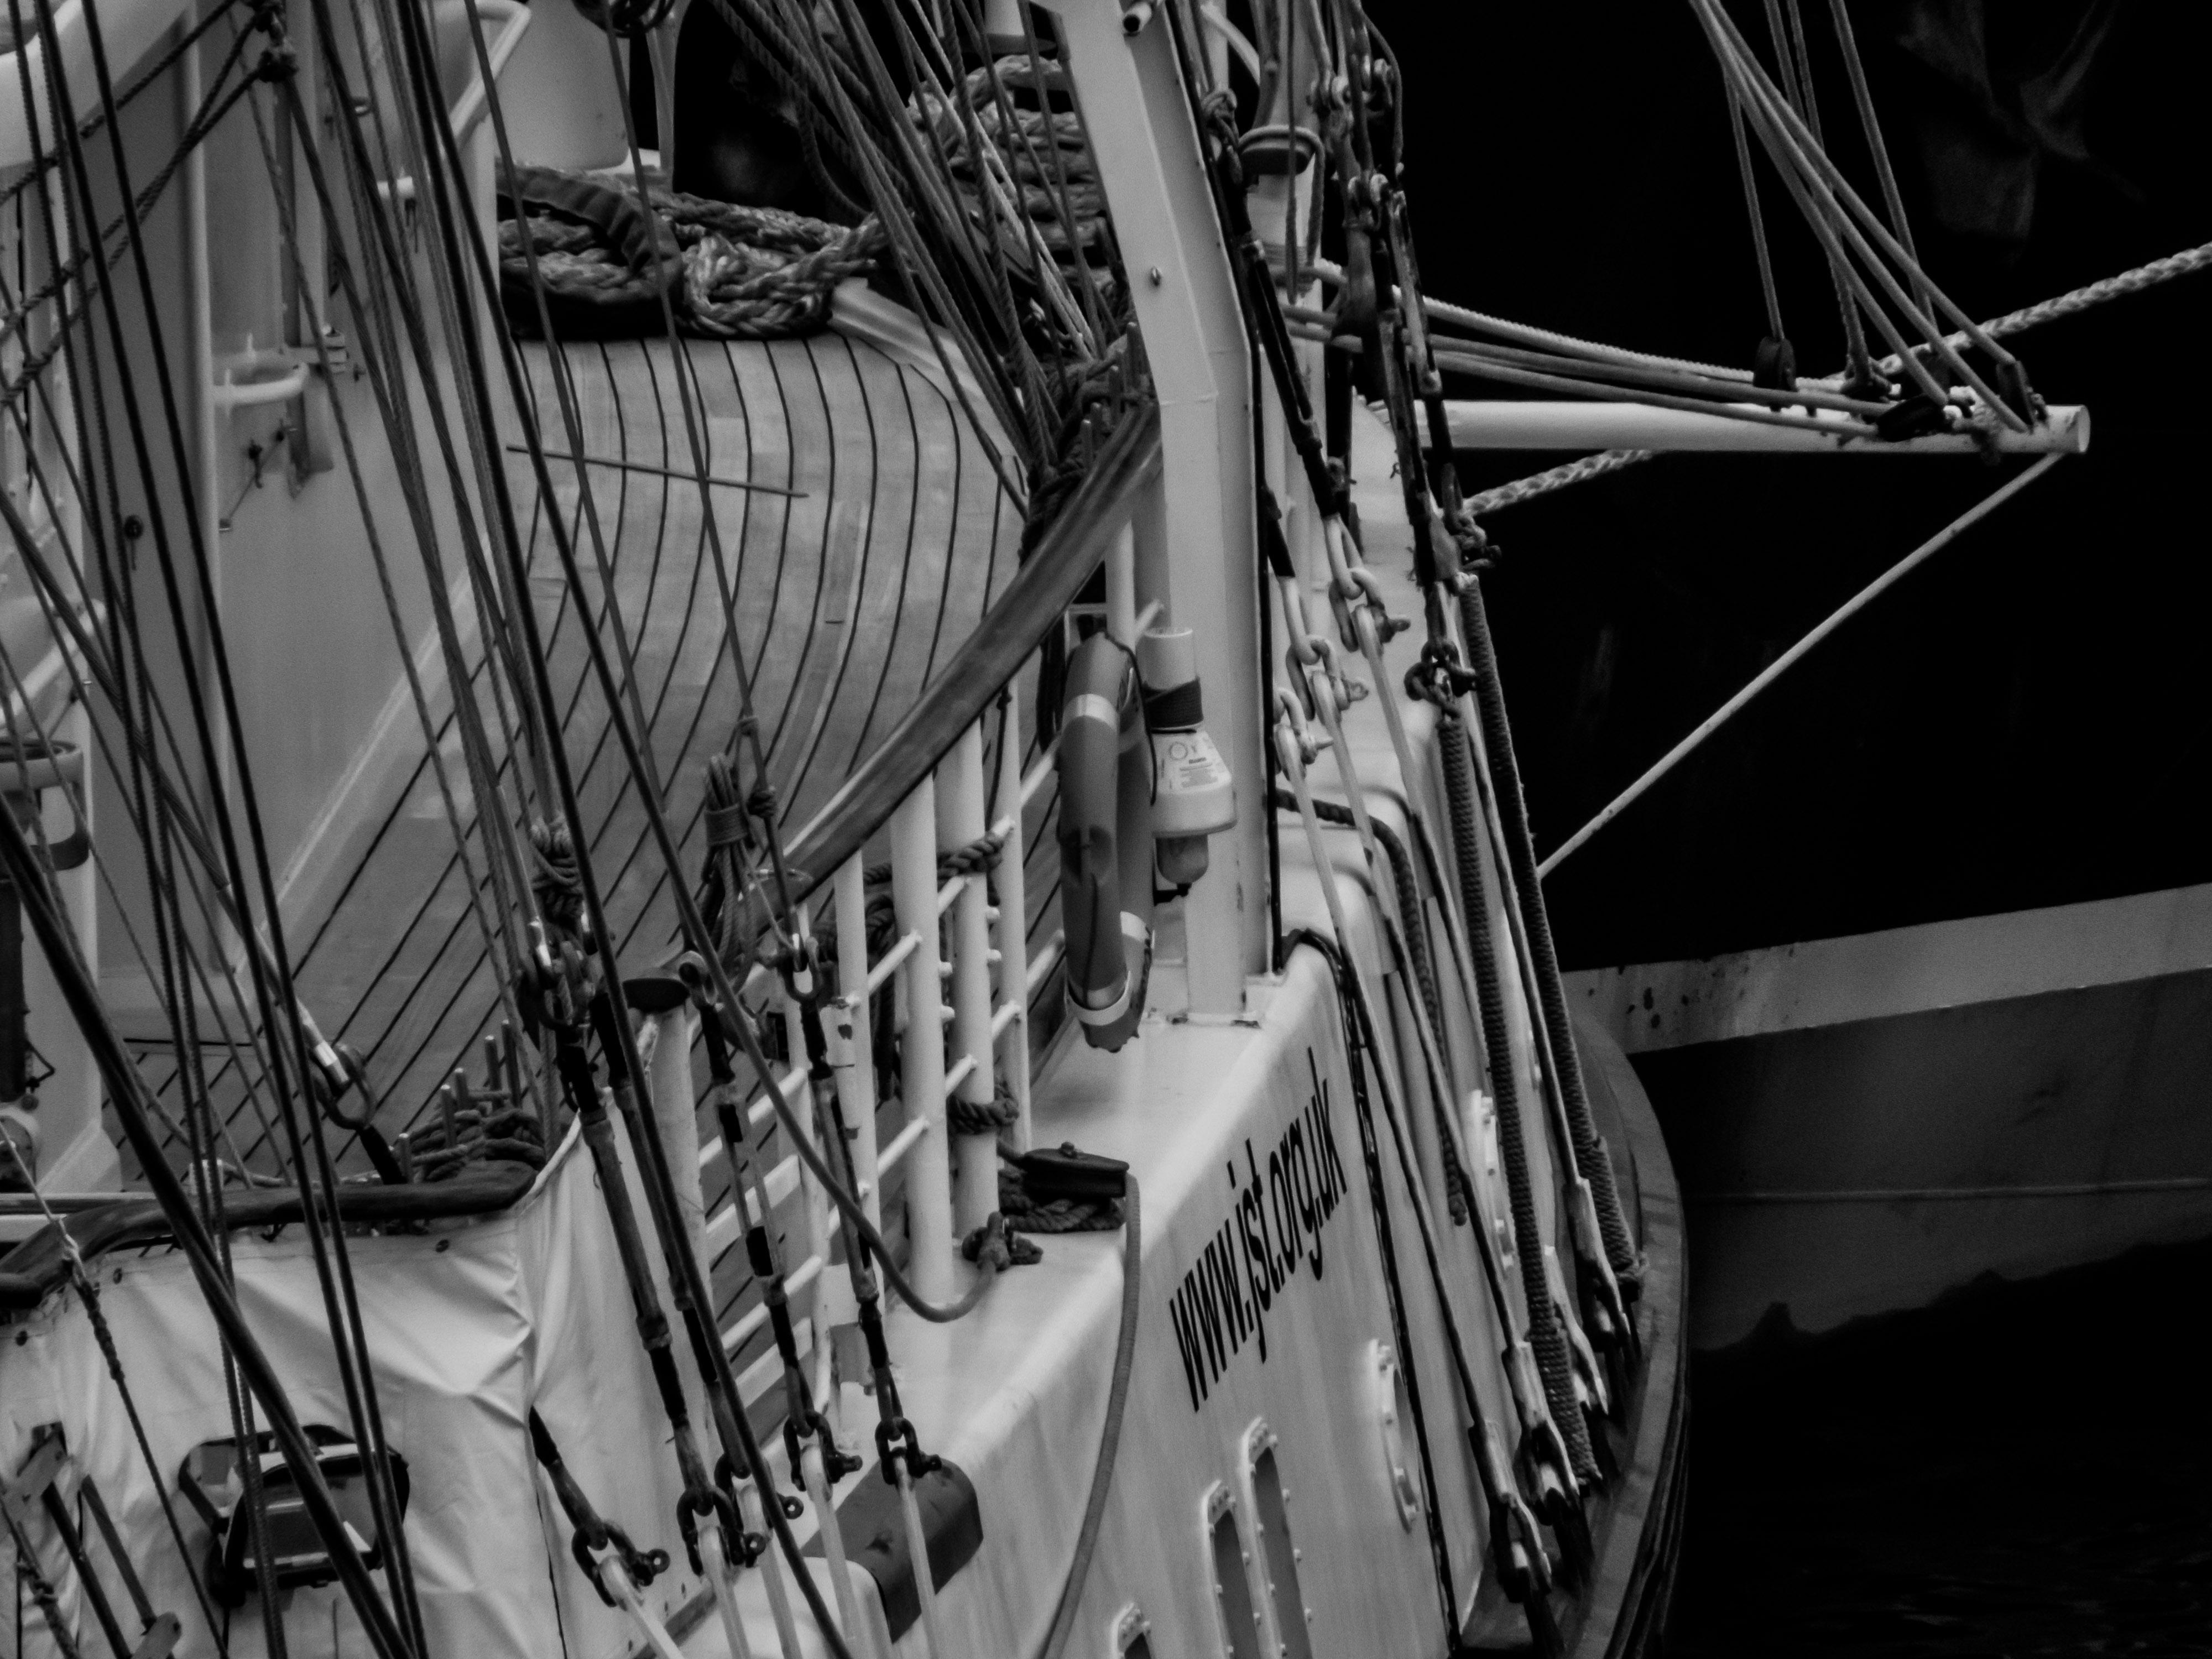 Ship, 2013, Deck, Old, Races, HQ Photo